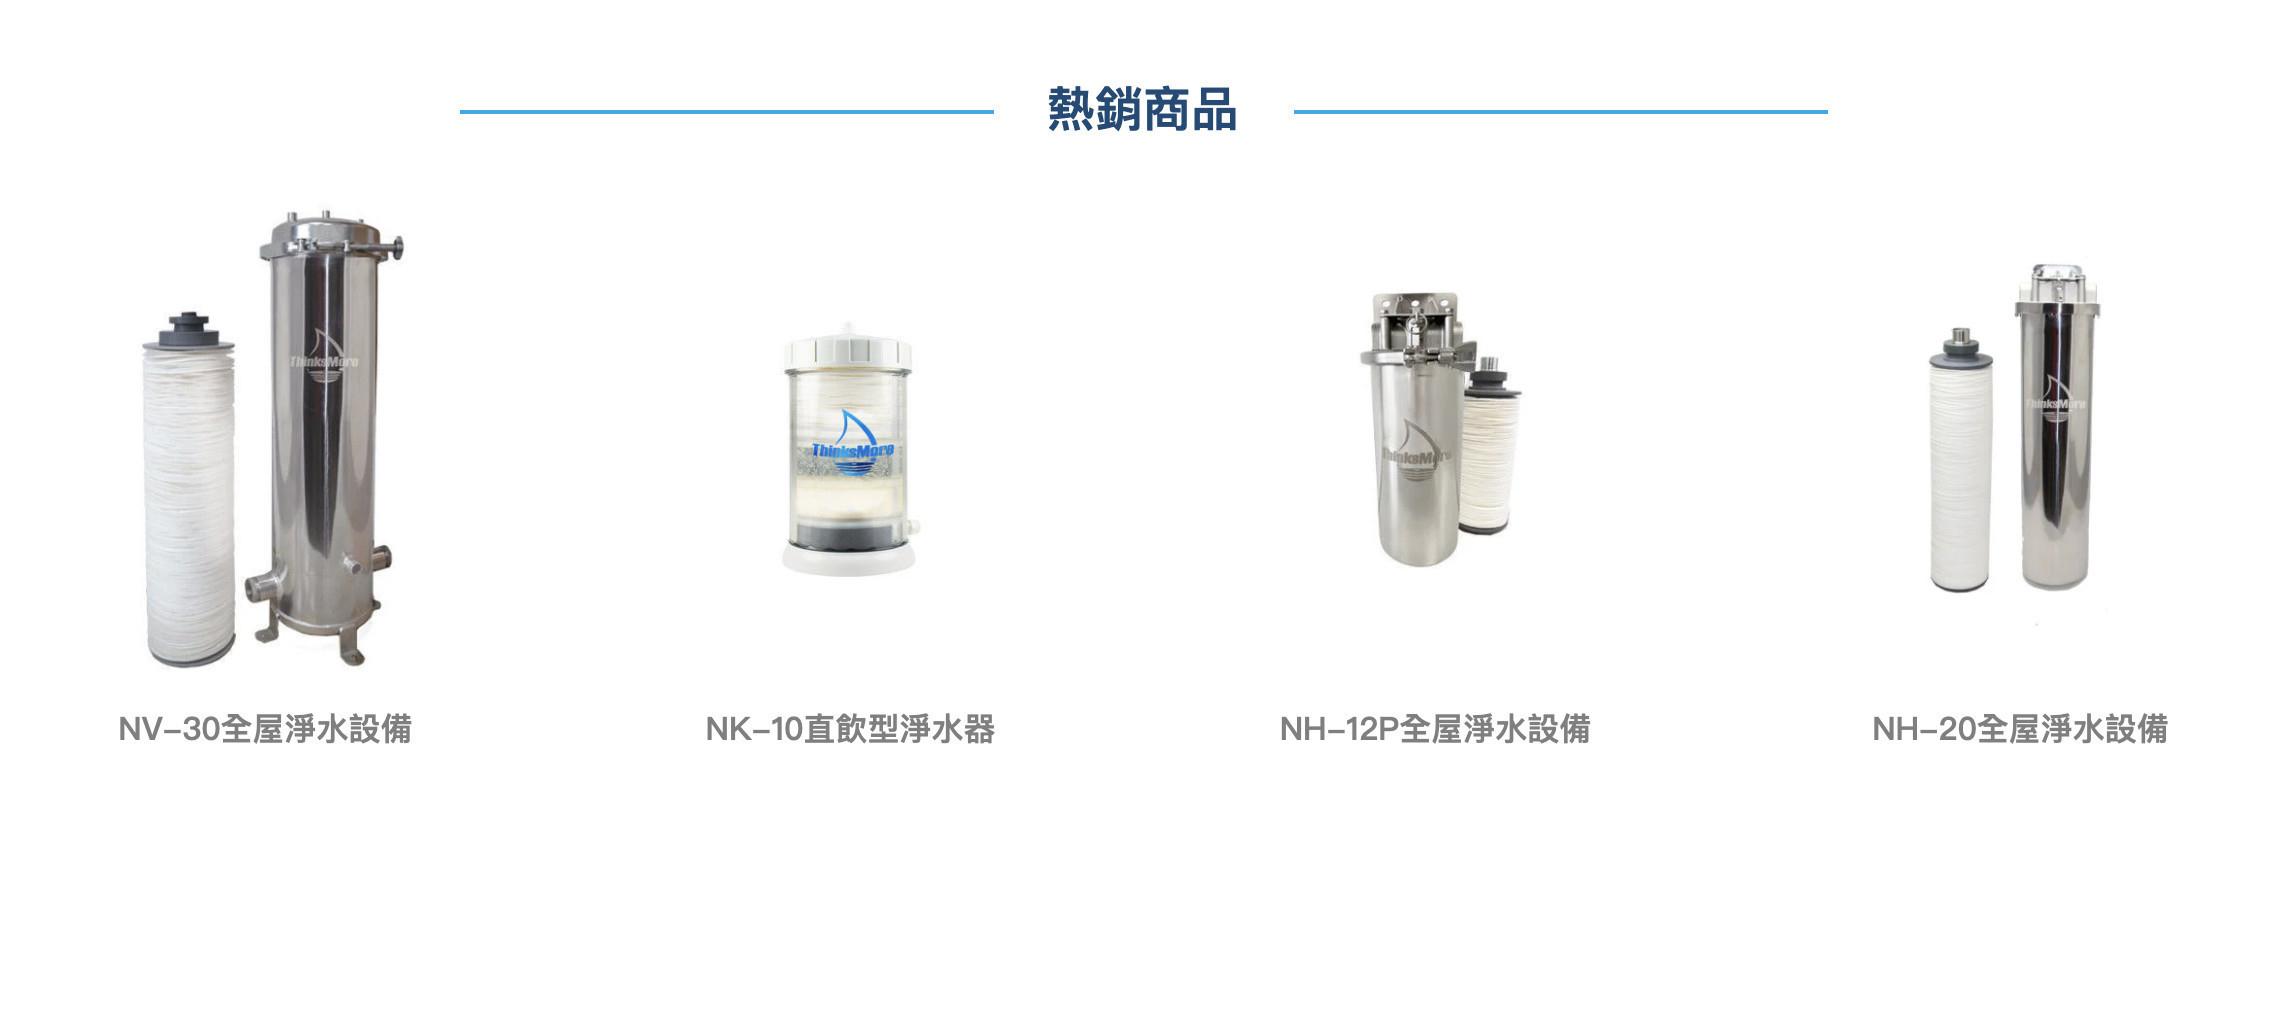 SEO網頁設計成功案例 ThinksMore 新世膜 熱銷產品